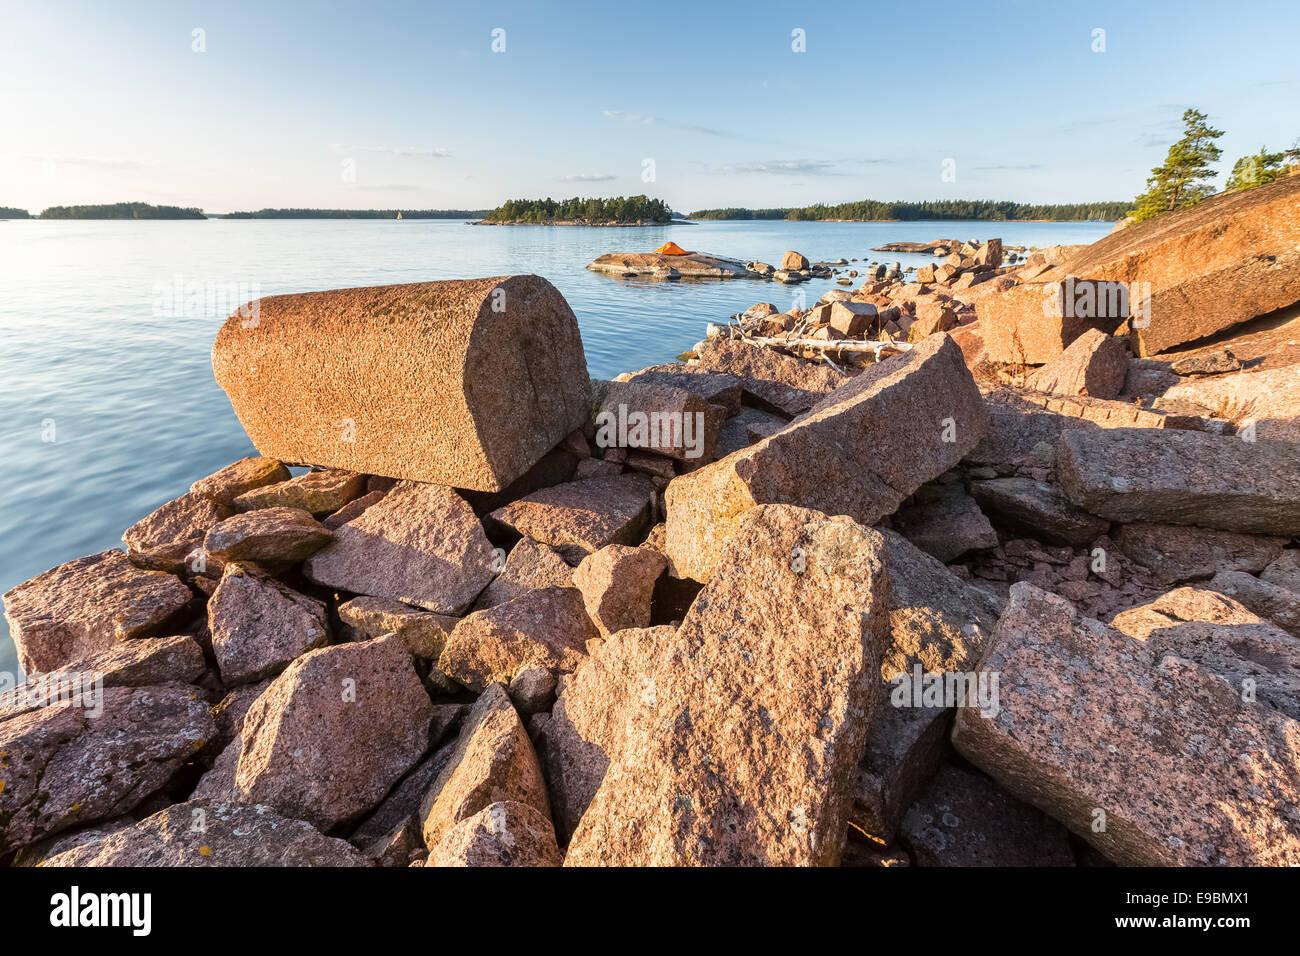 So called Napoleon's stone at Onaslandet island, Porvoo, Finland, Europe, EU - Stock Image